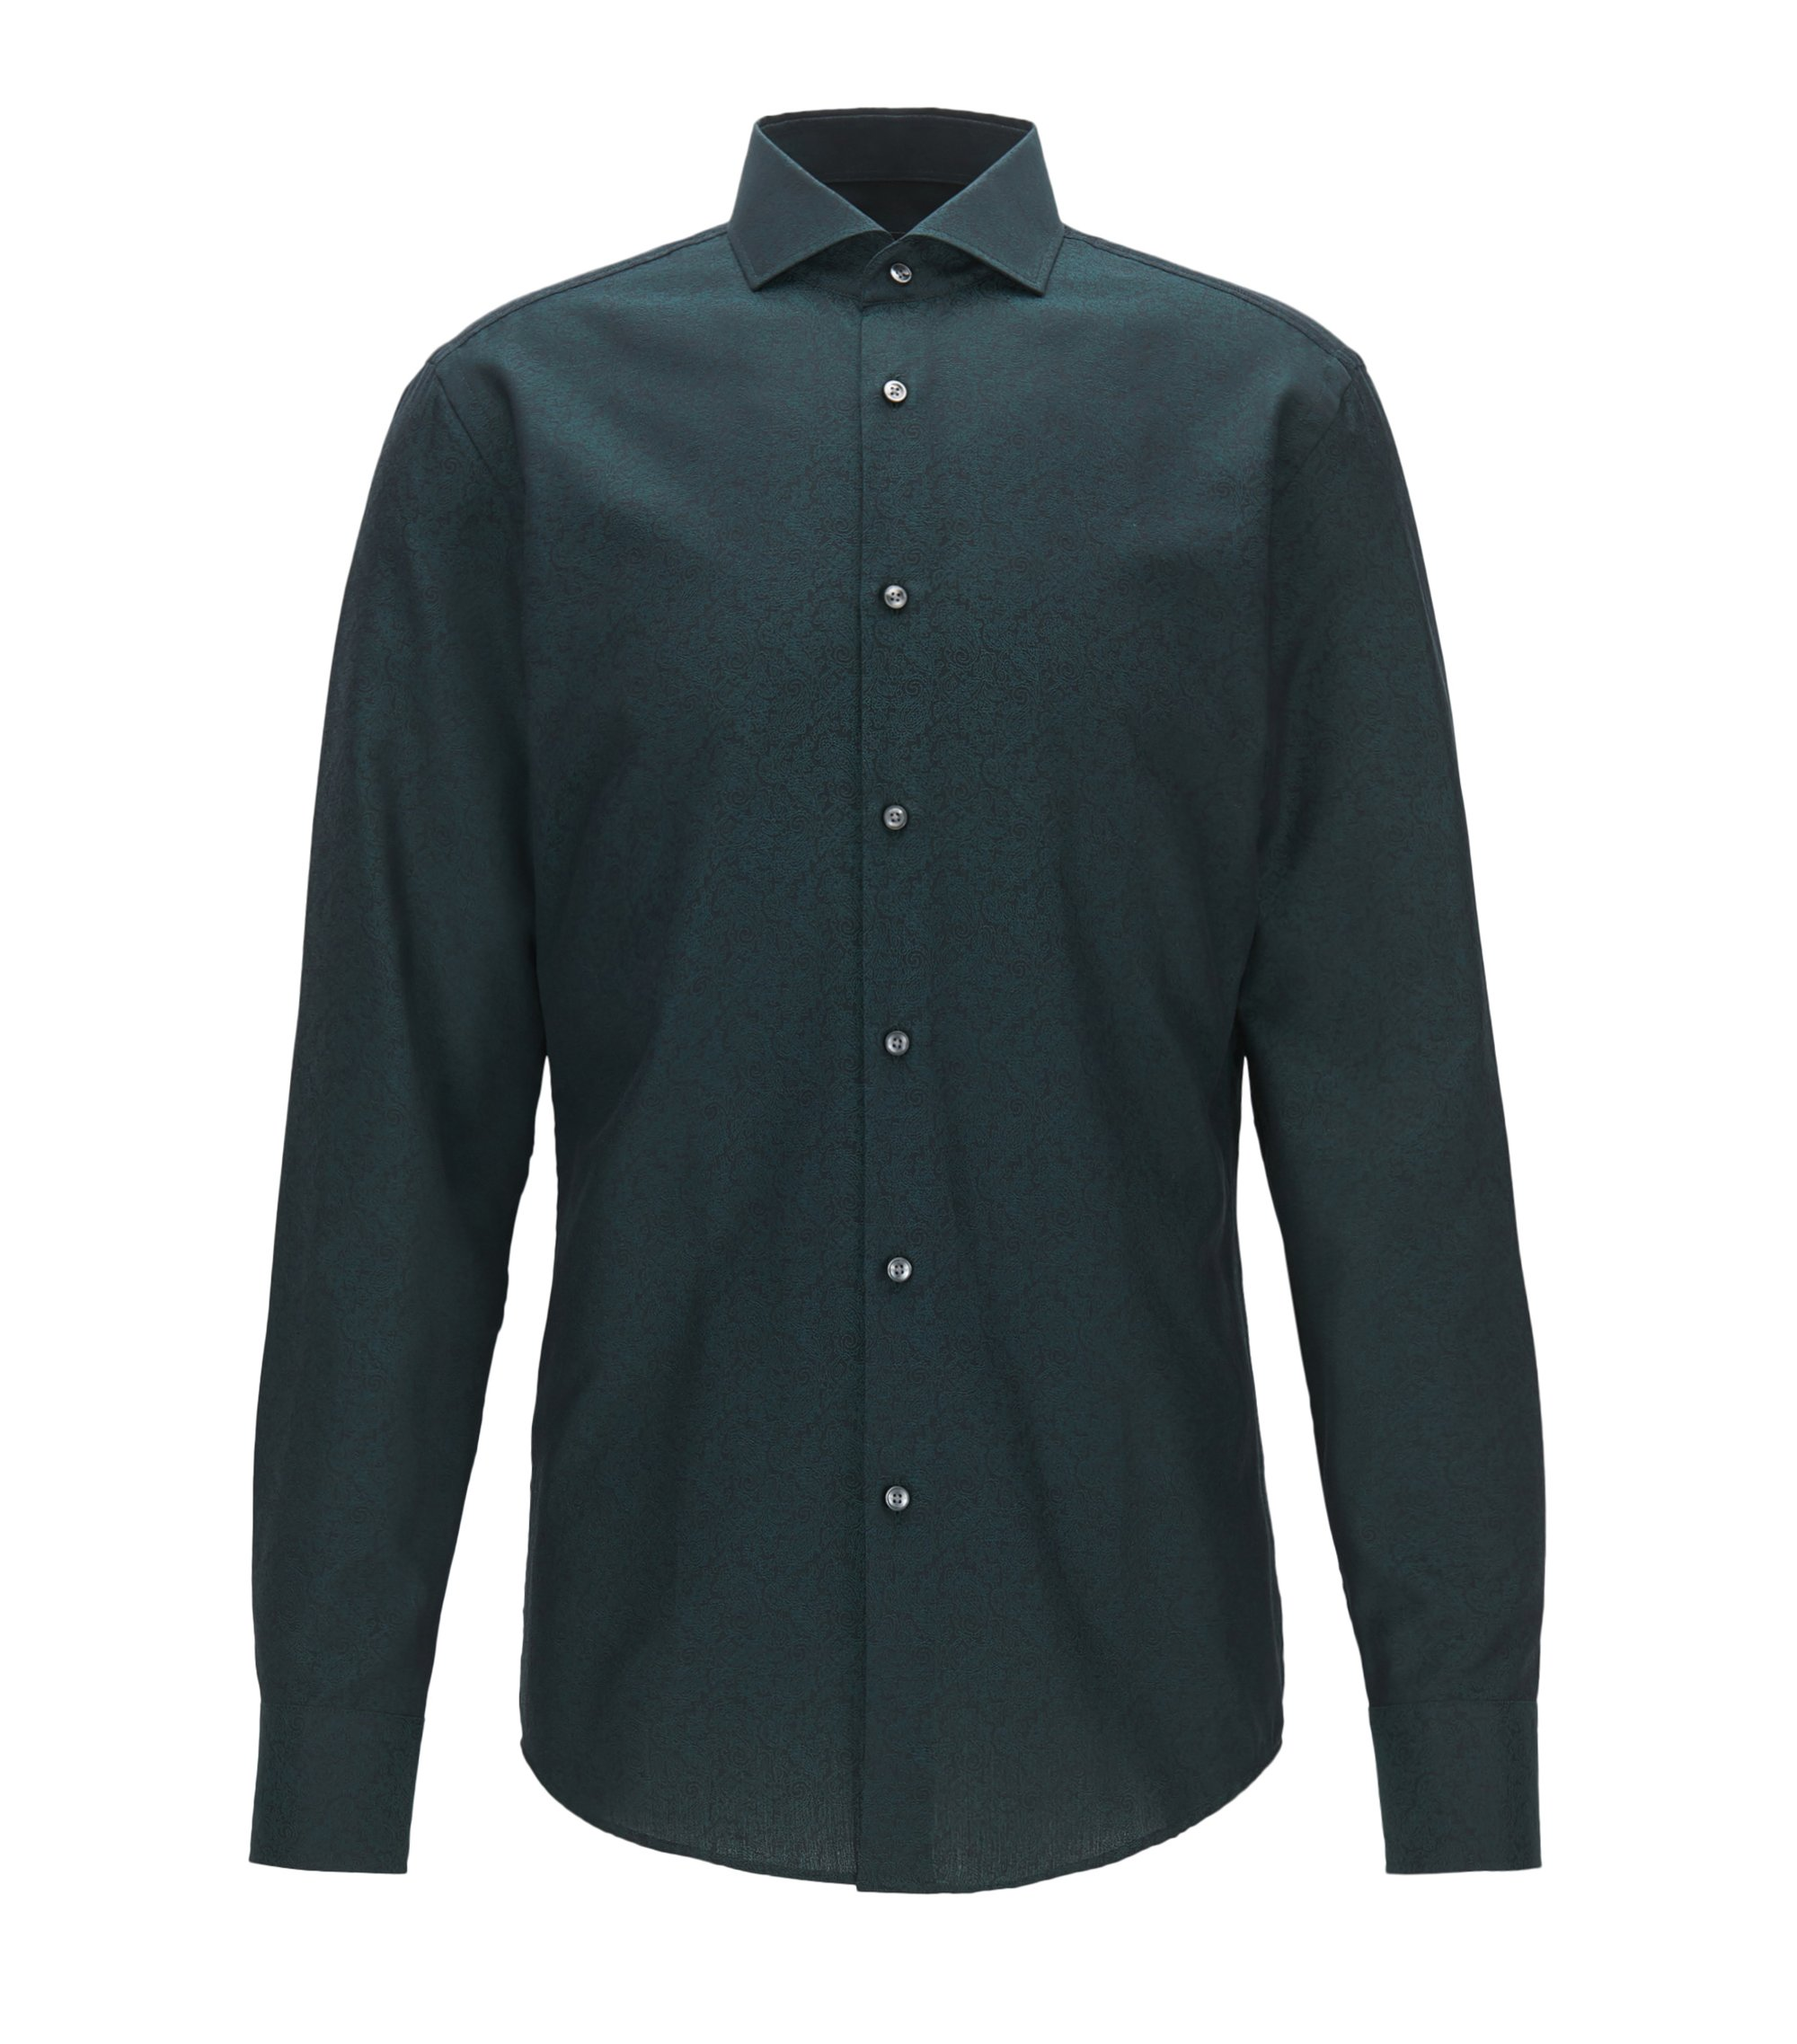 Slim-fit overhemd in katoenen jacquard met paisleydessin, Bedrukt